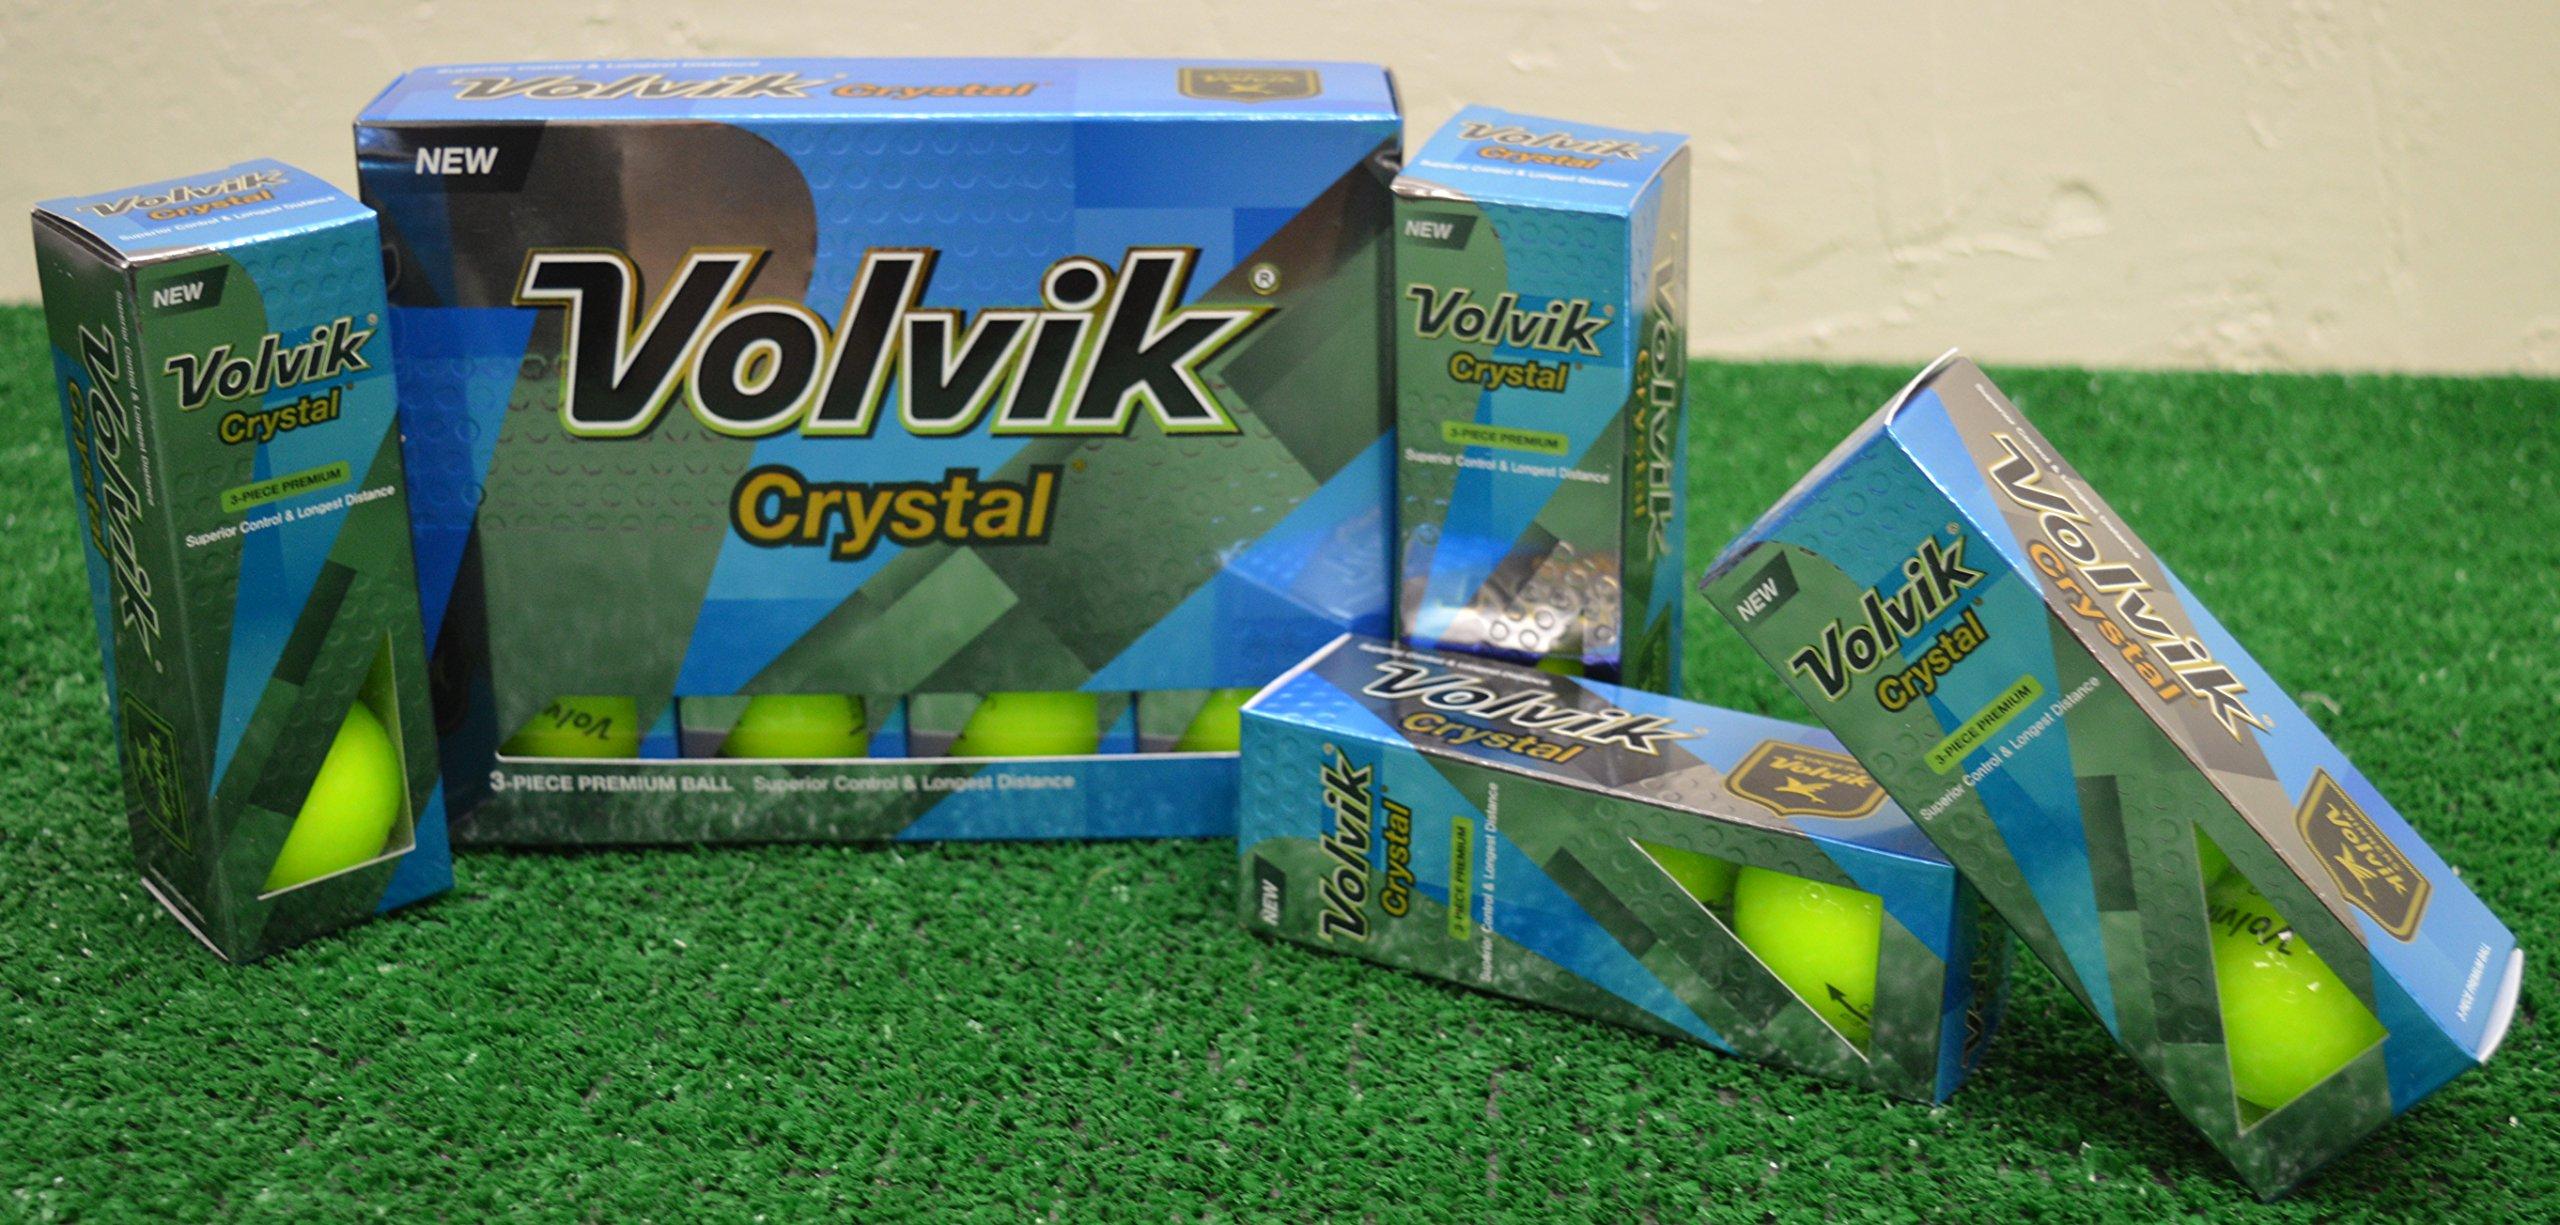 3 Dozen 2016 Volvik Crystal Green Golf Balls - New in Box